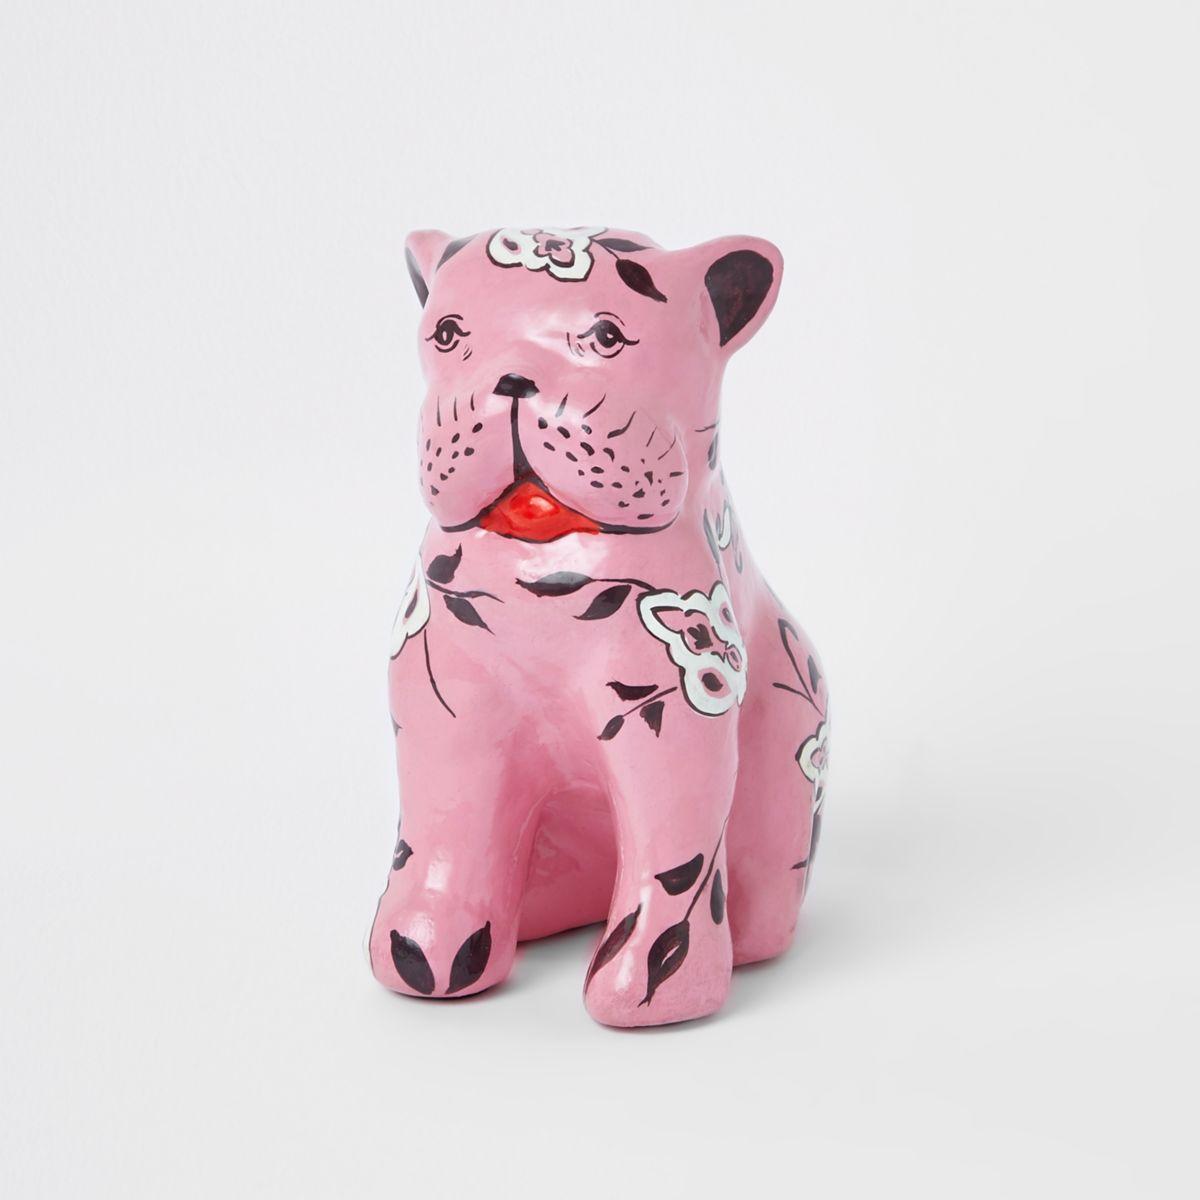 Pink dog ornament